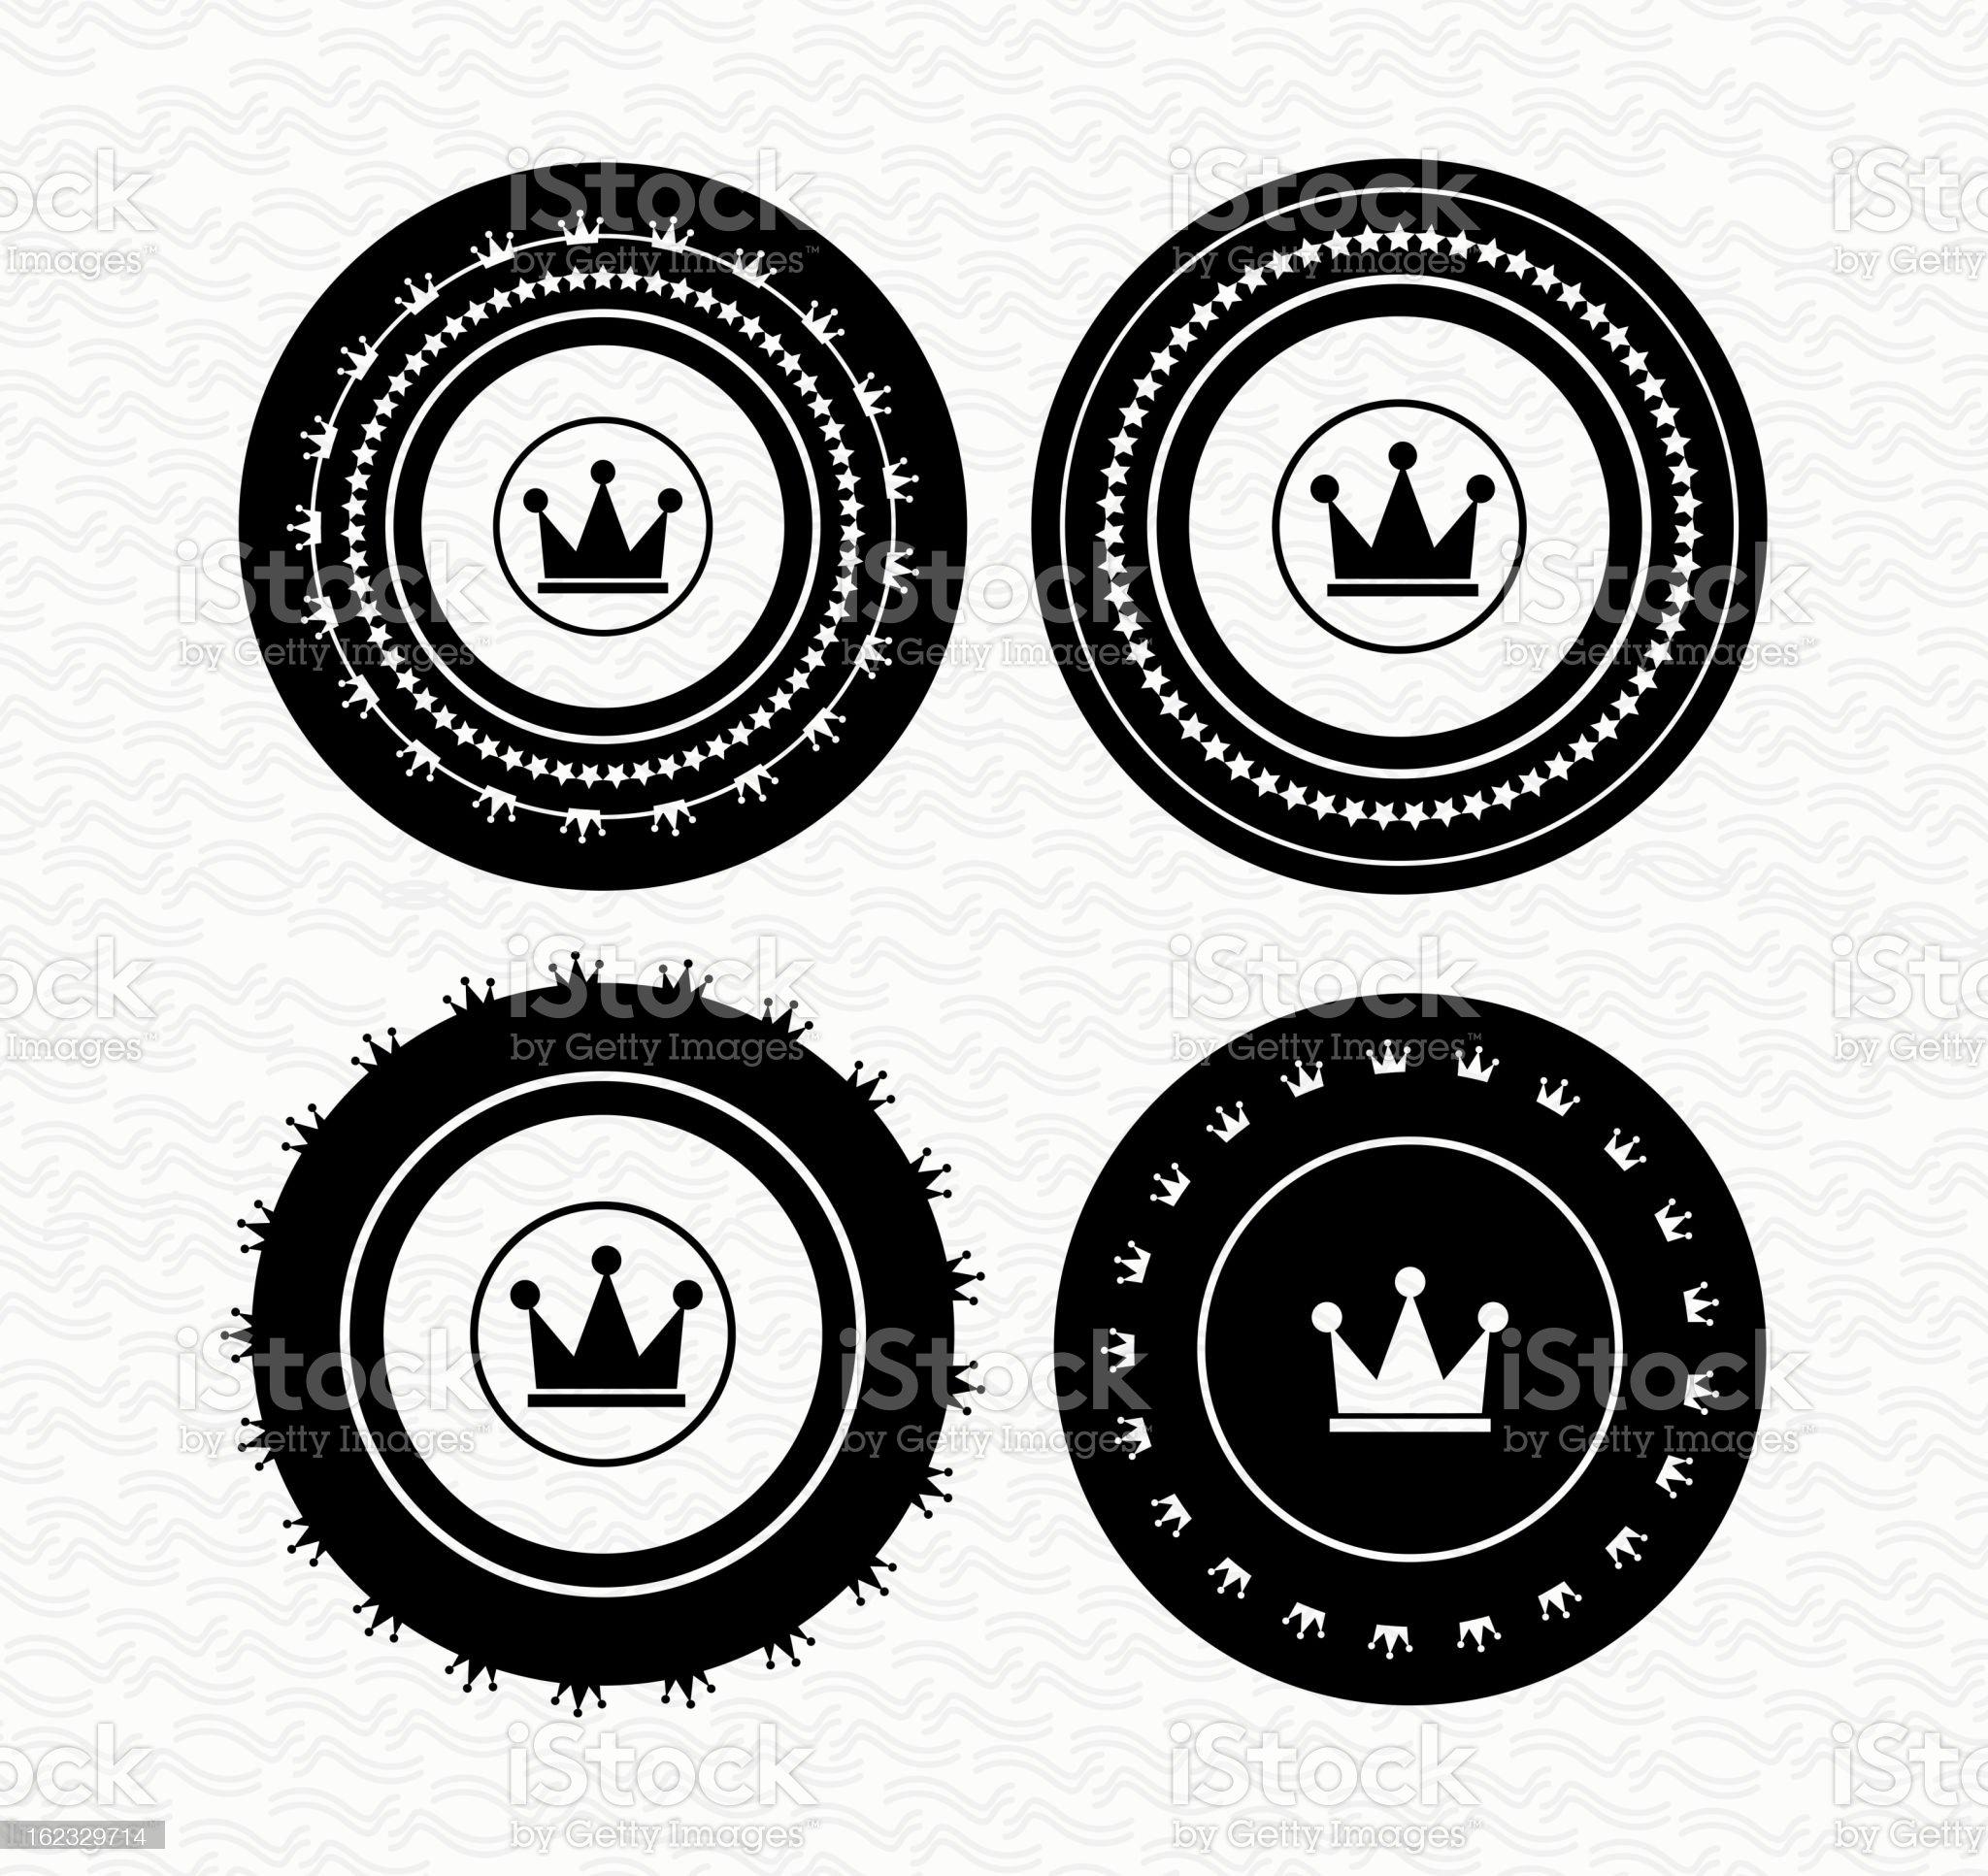 Vector vintage royal badges royalty-free stock vector art